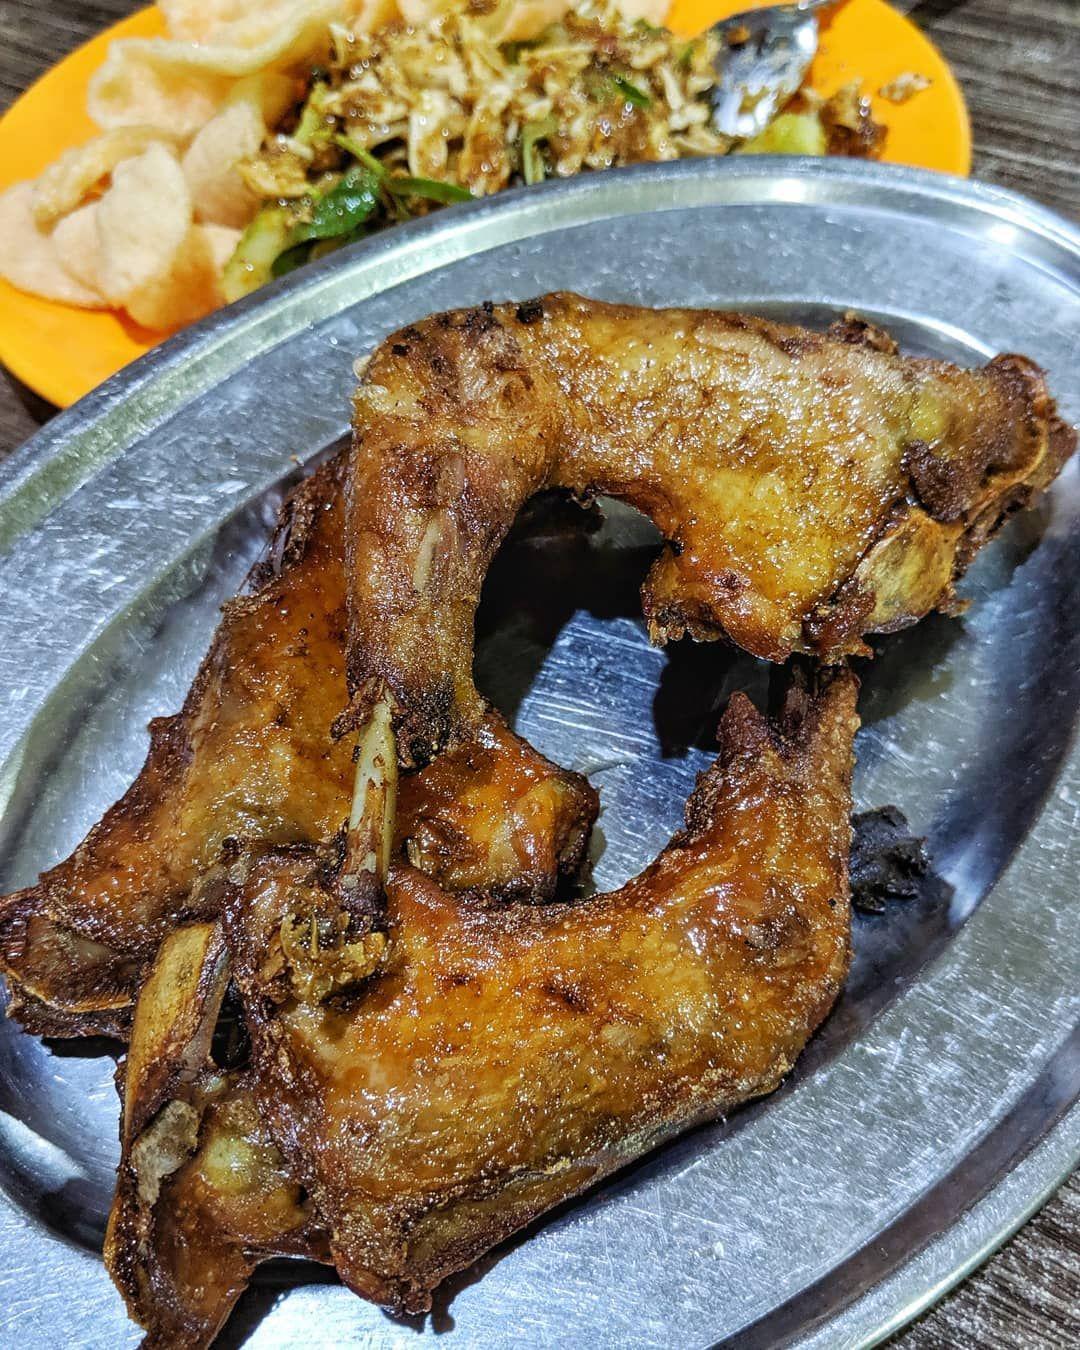 tempat makan ayam goreng enak di Bandung